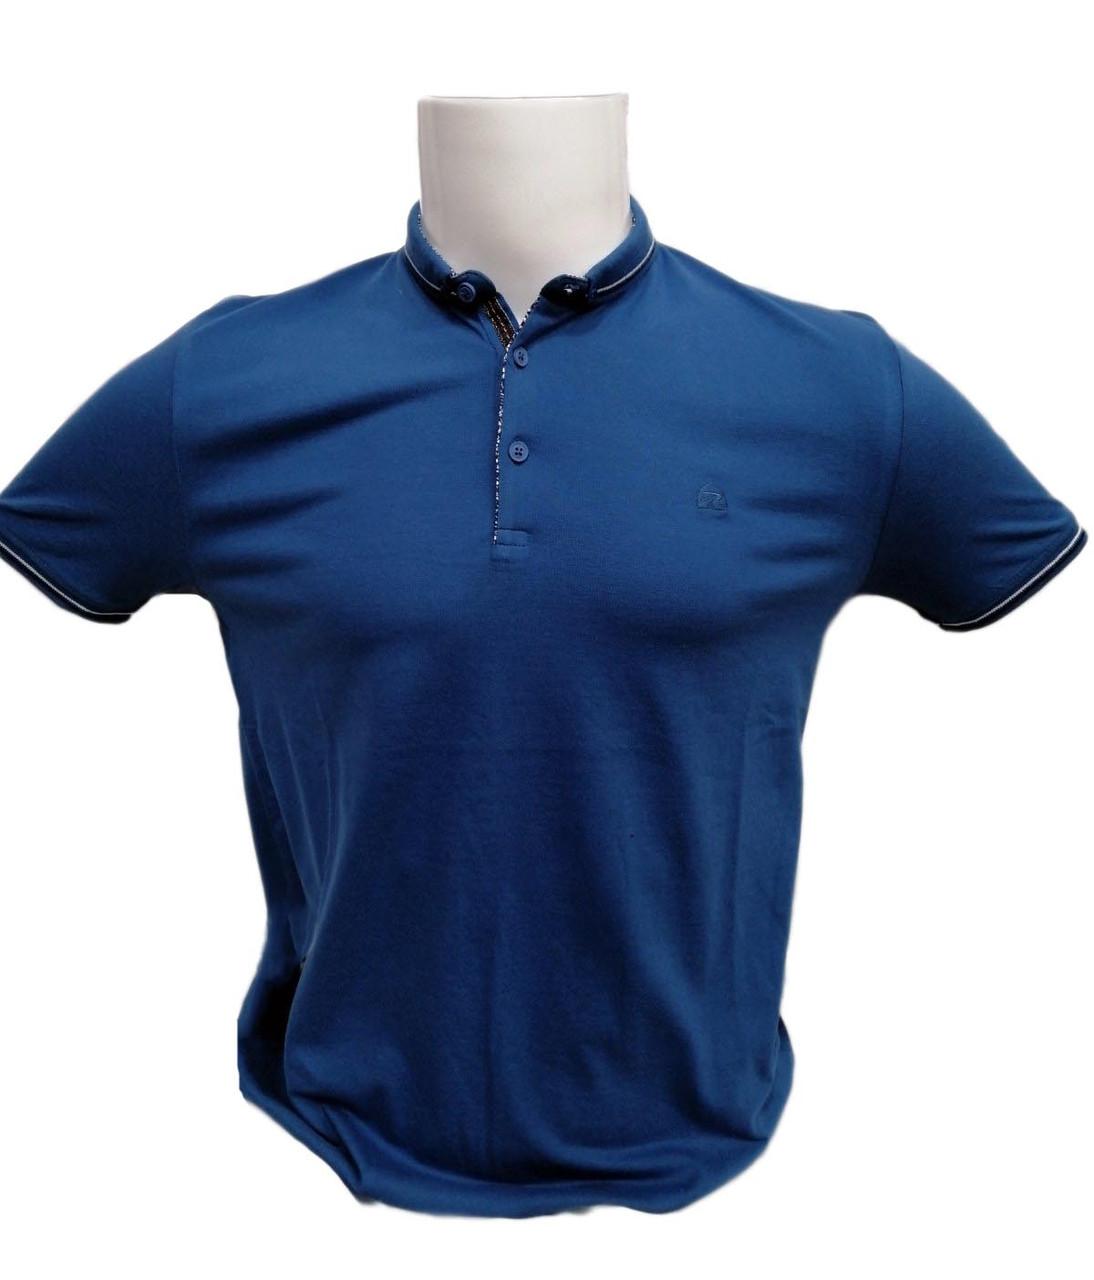 Футболка поло мужская STEEL WAY из ткани ла коста Синяя